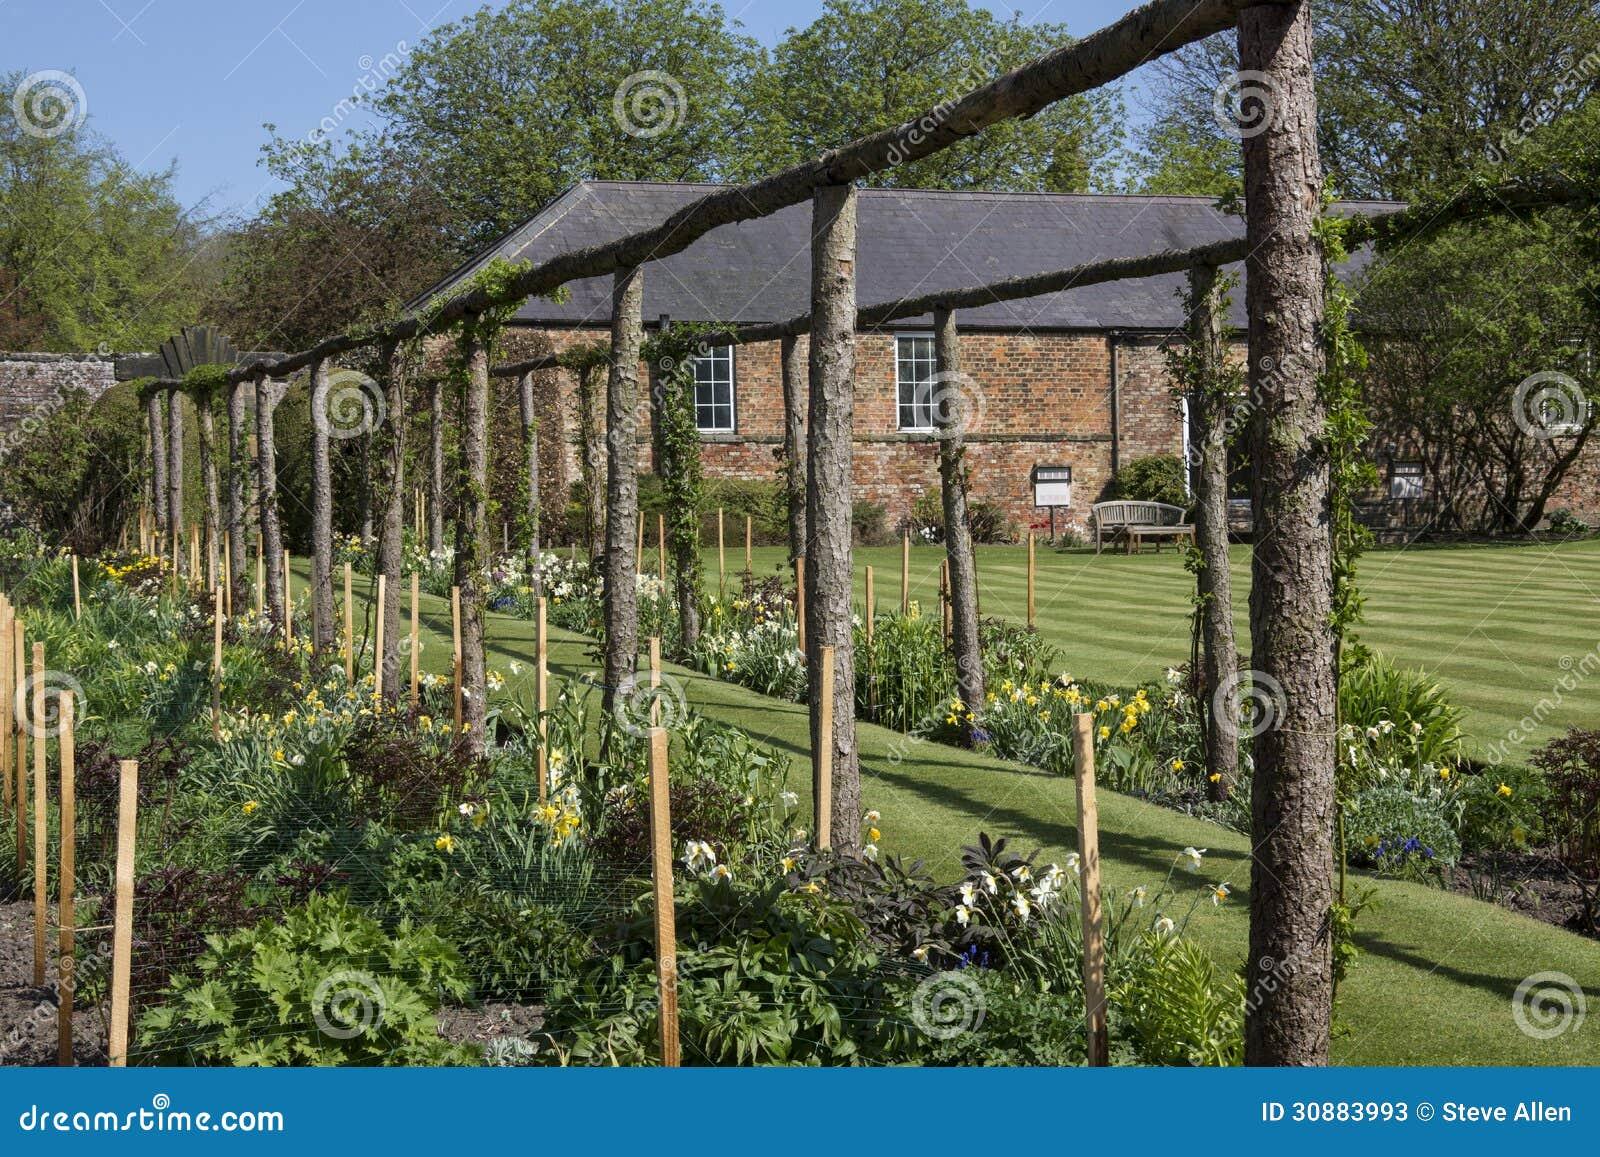 Jardin anglais de pays yorkshire angleterre photo for Jardin anglais en angleterre